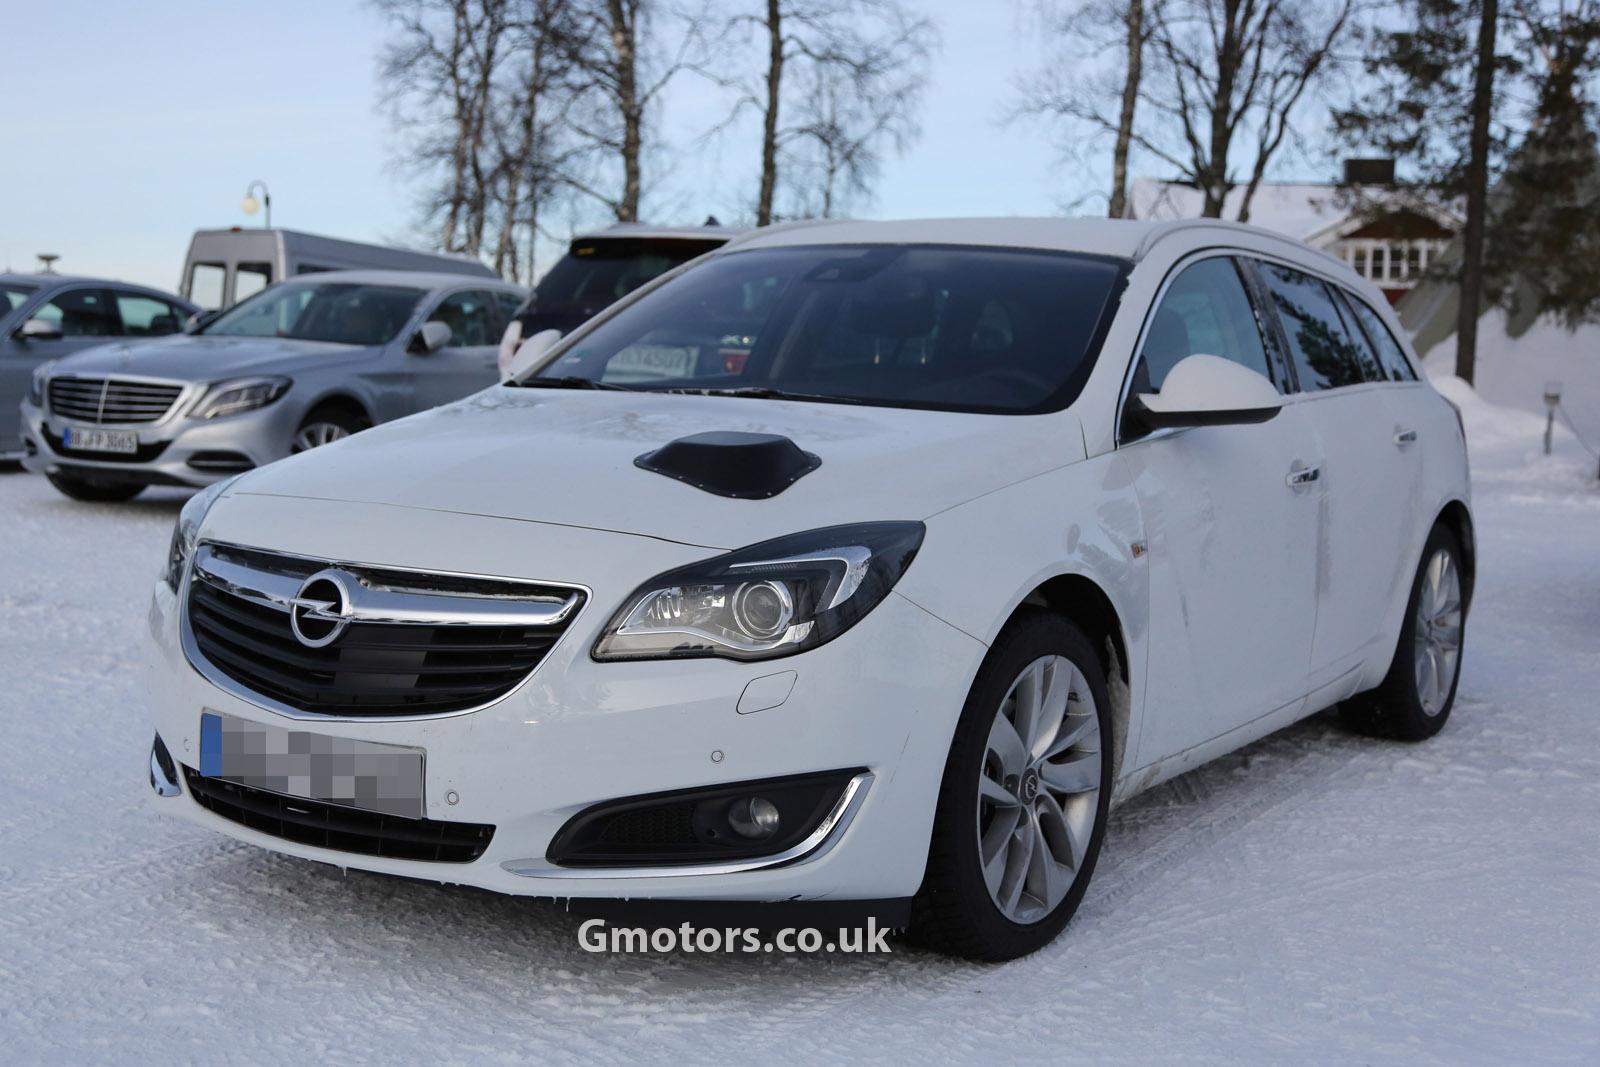 2017 - [Opel] Insignia Grand Sport [E2JO] 2016-Vauxhall-Opel-Insignia-mule-6